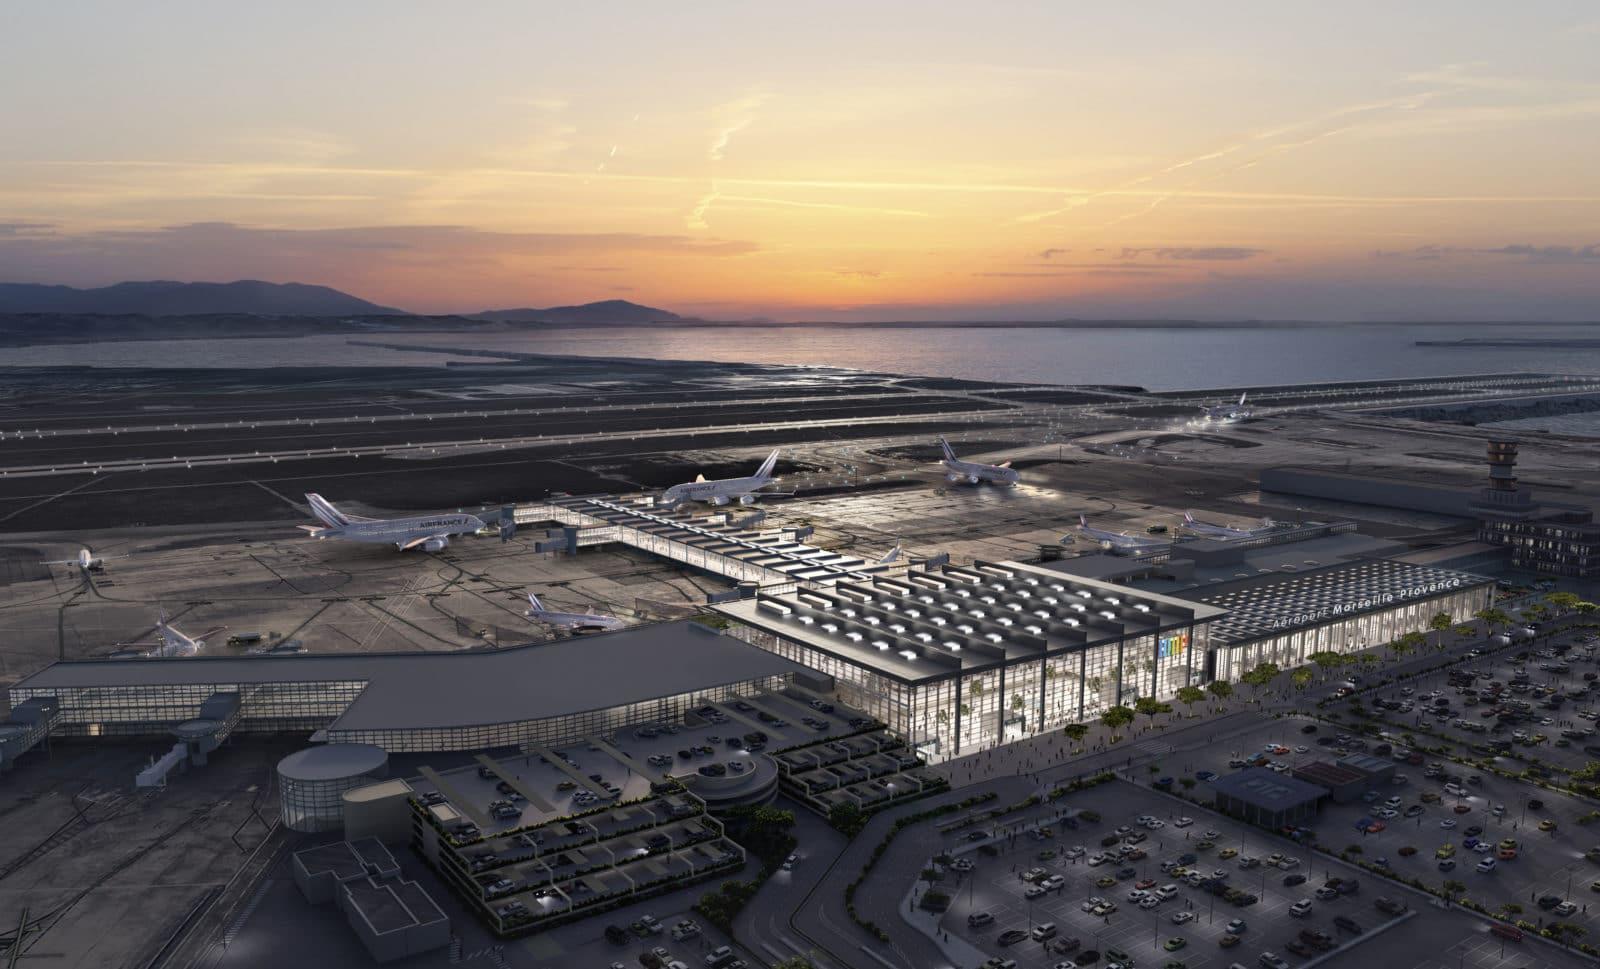 aeroport marseille extension foster 6